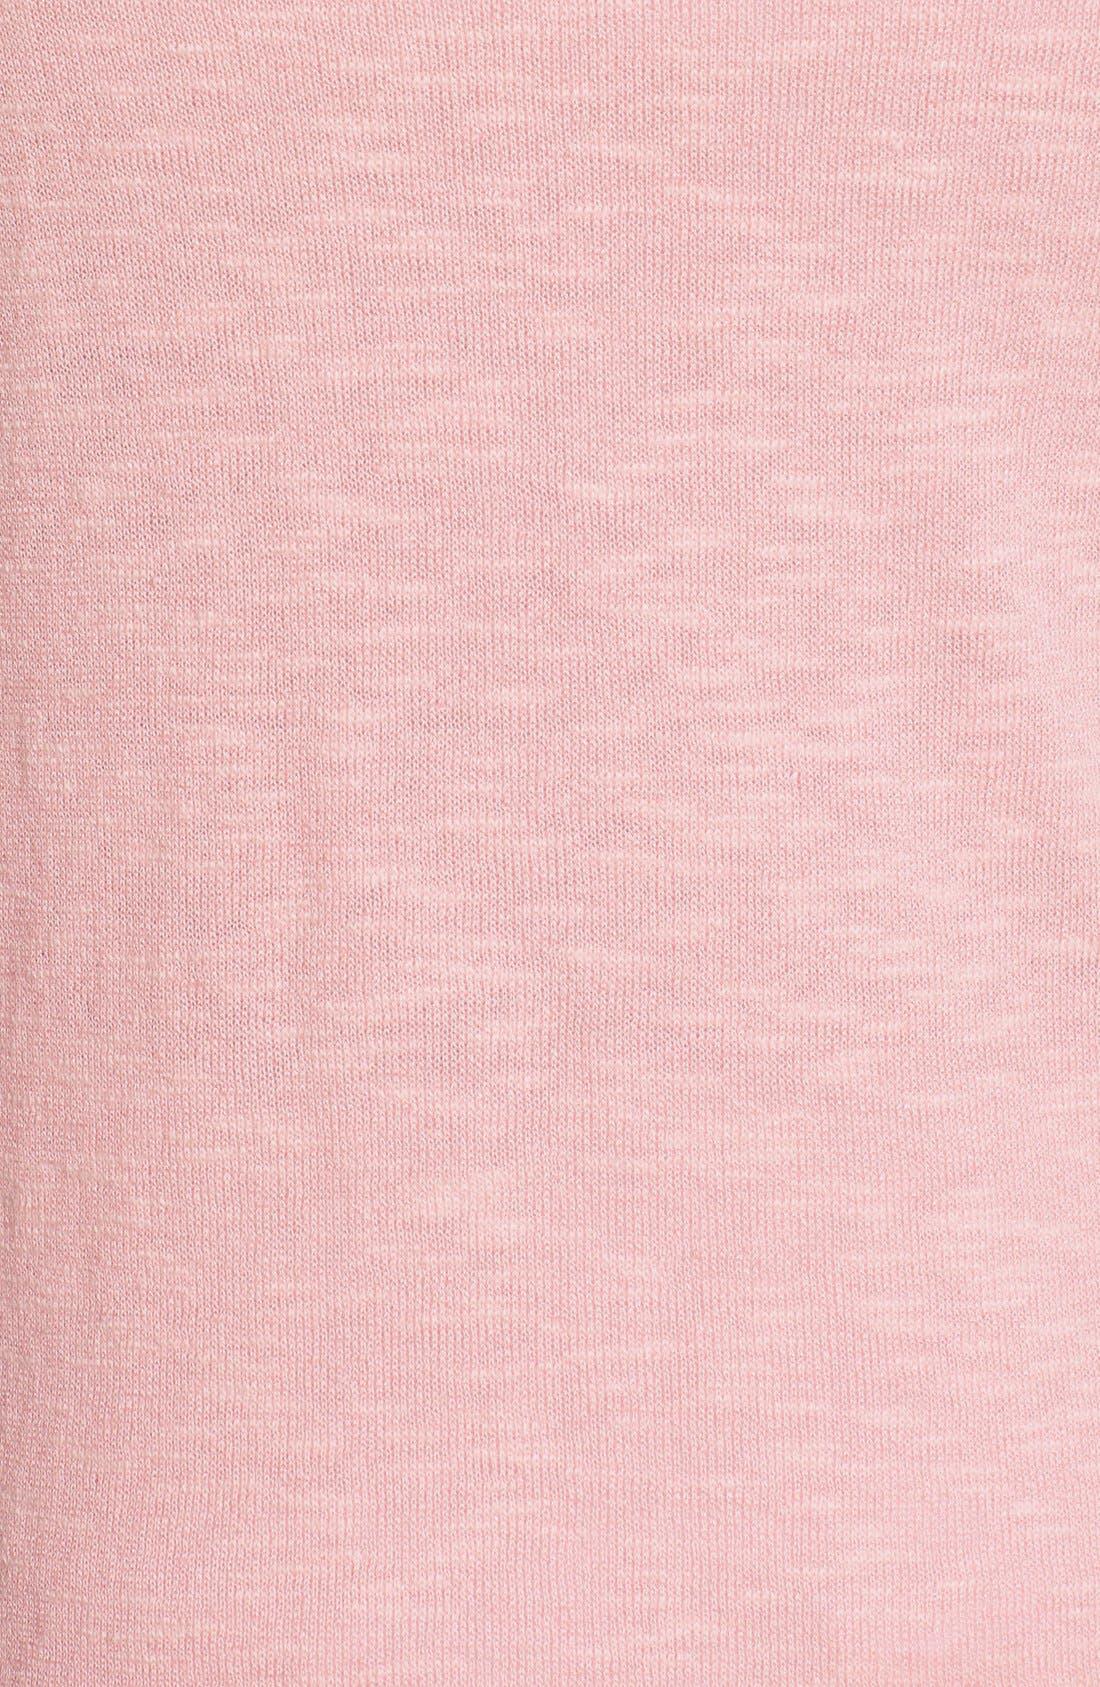 Alternate Image 5  - Eileen Fisher Organic Linen & Cotton Bateau Neck Sweater (Regular & Petite)